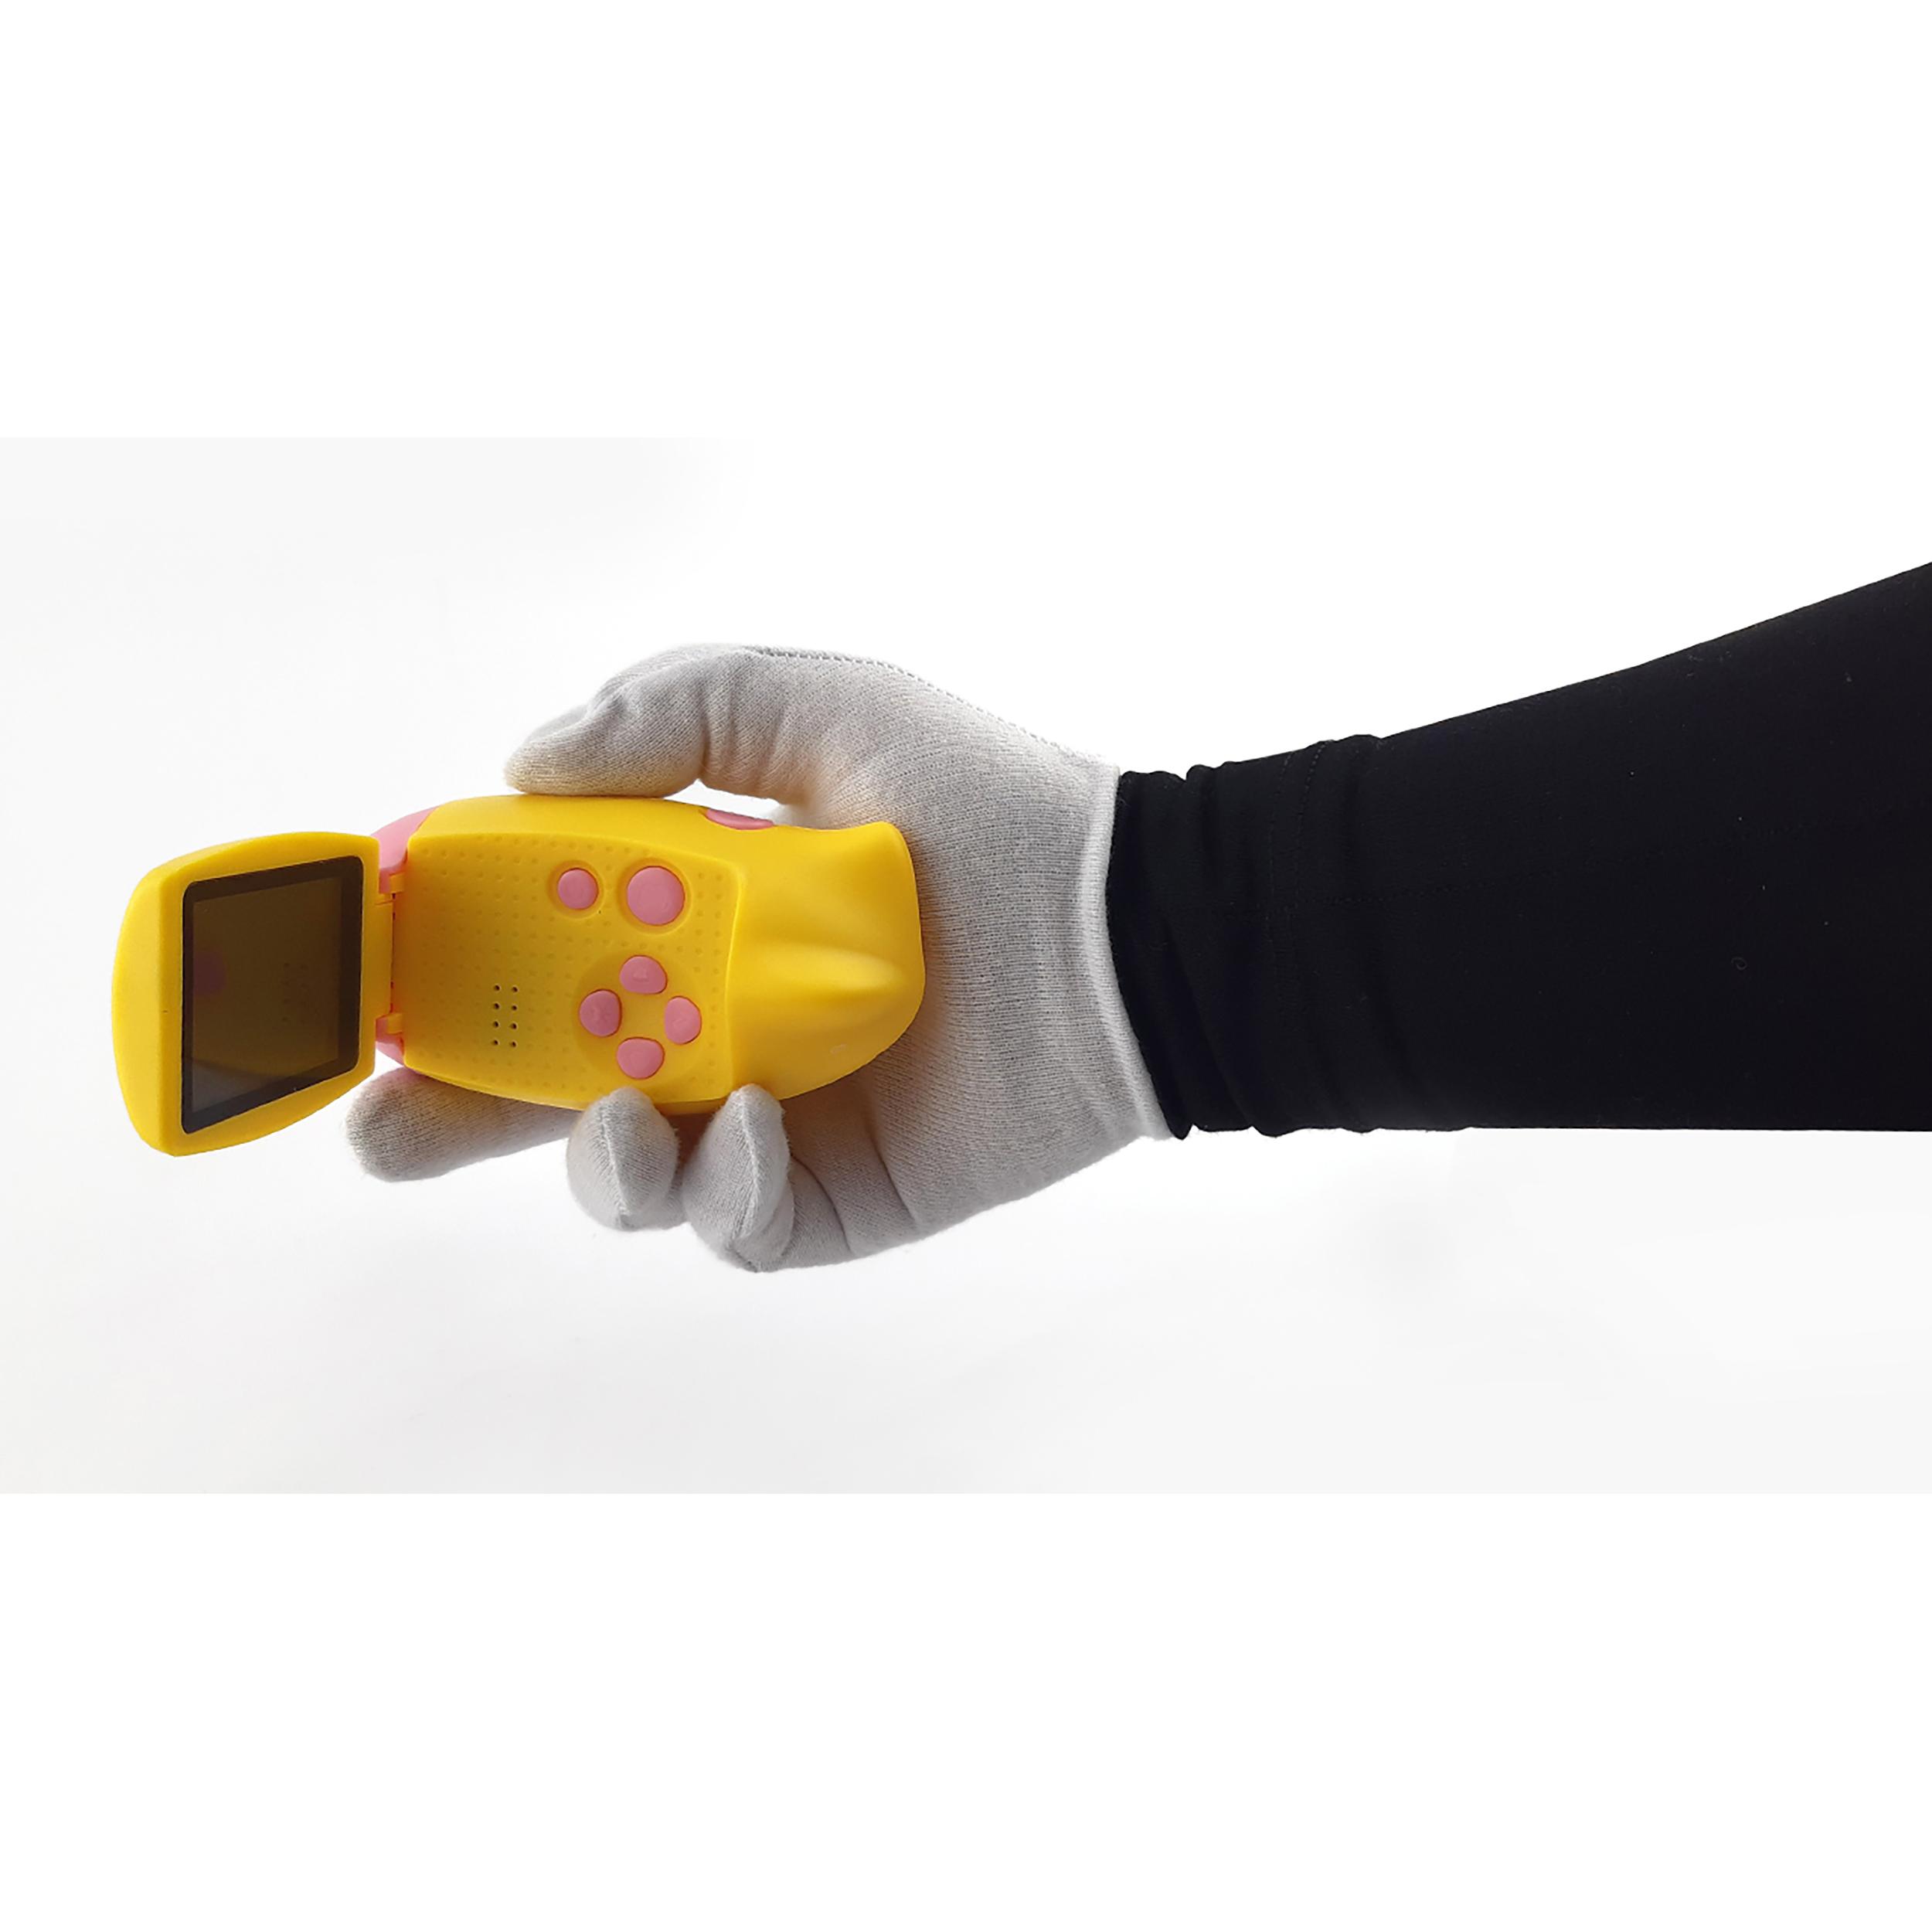 دوربین دیجیتال آکسون مدل AX6066 main 1 5